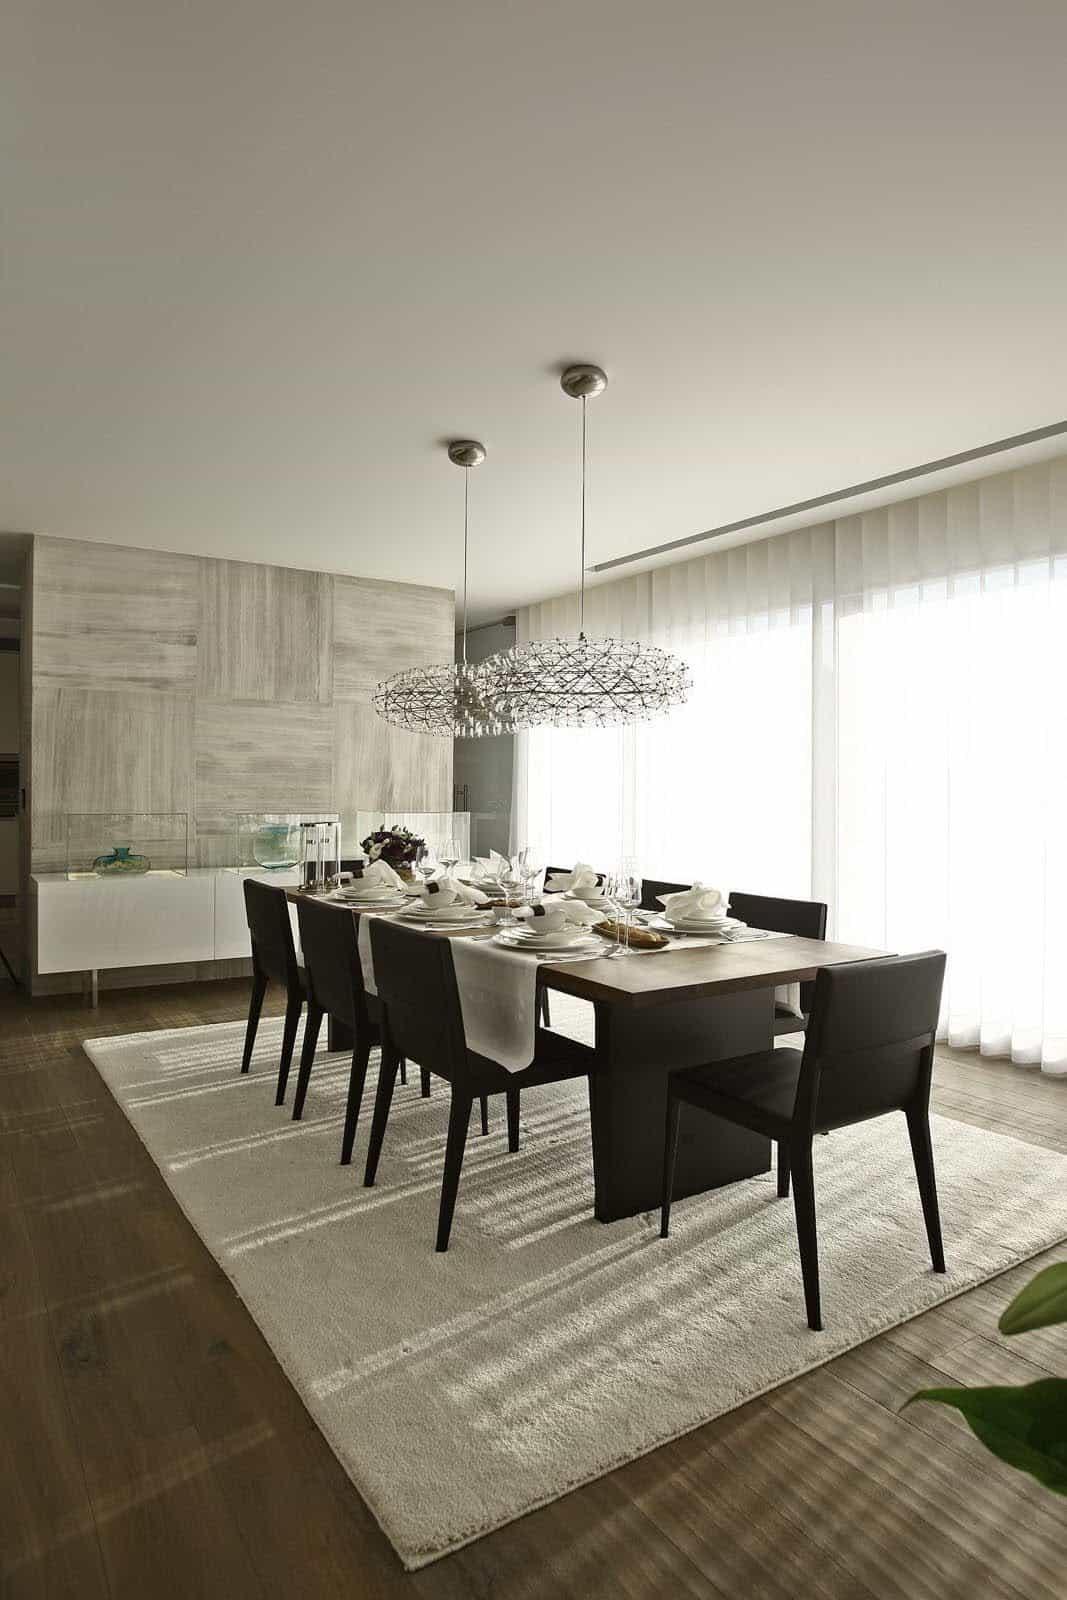 S house interior by tanju özelgin 7